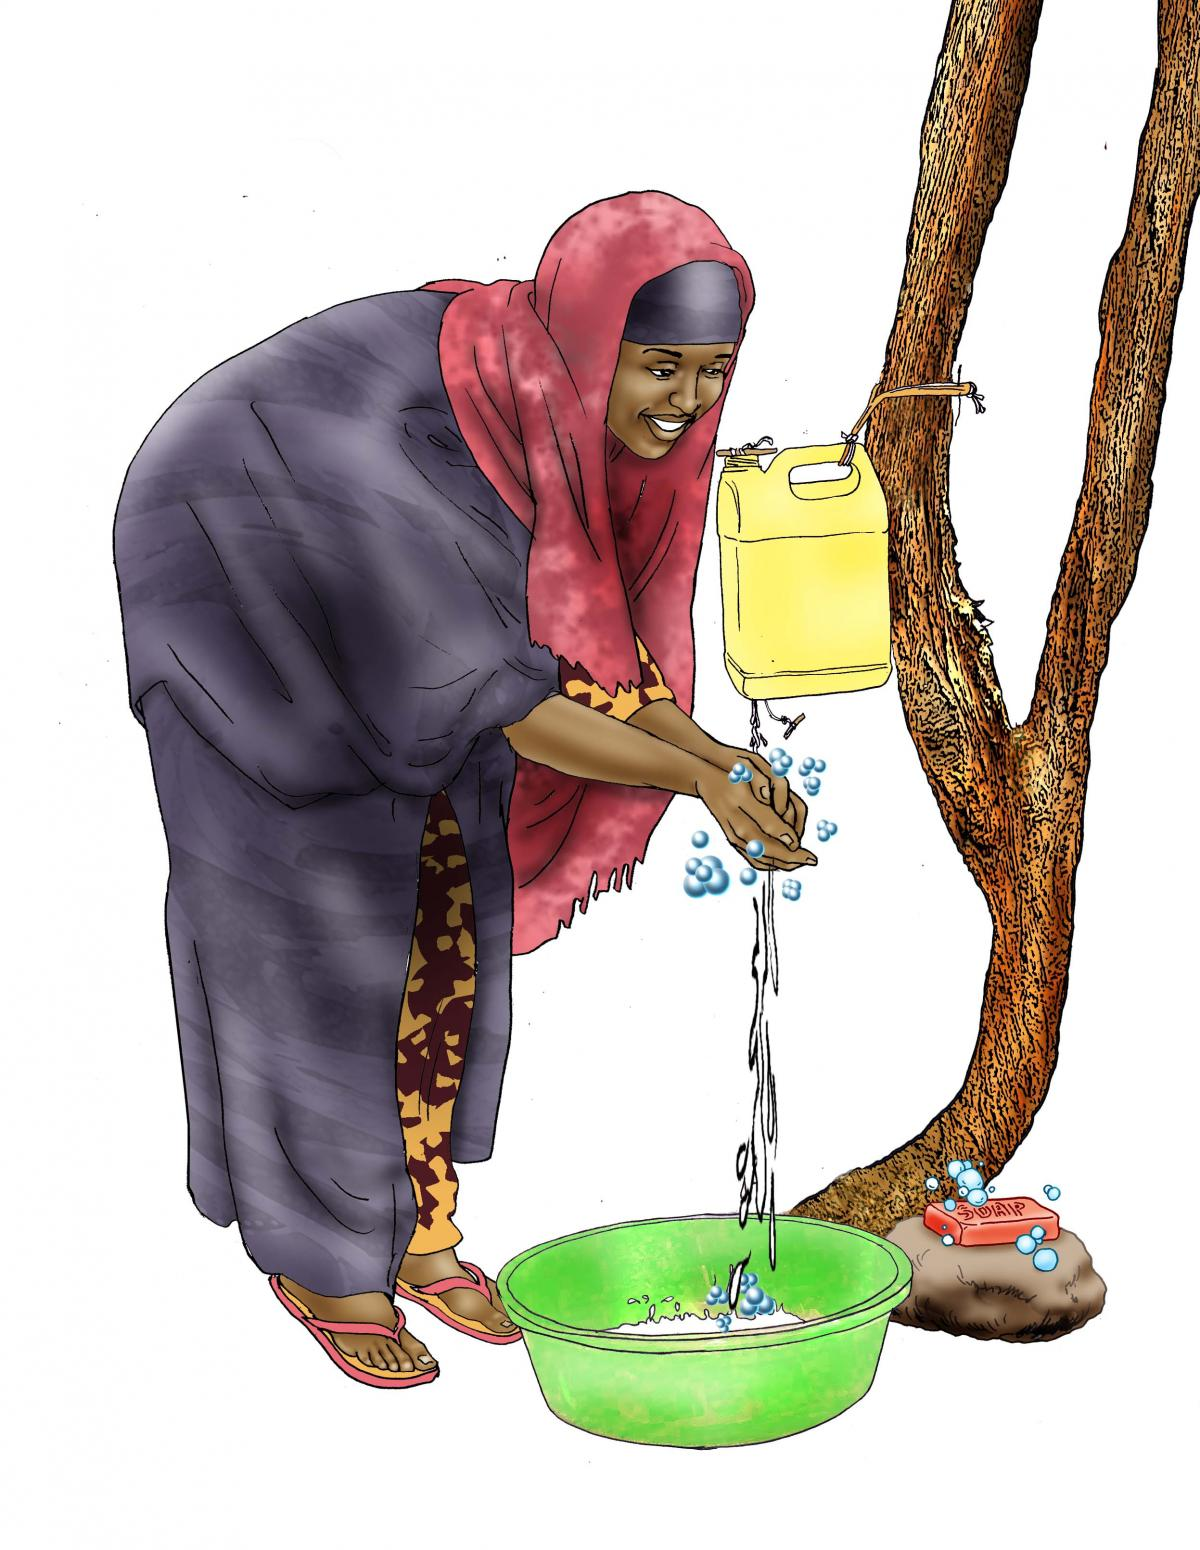 Sanitation - Woman washing hands - 04 - Kenya Dadaab